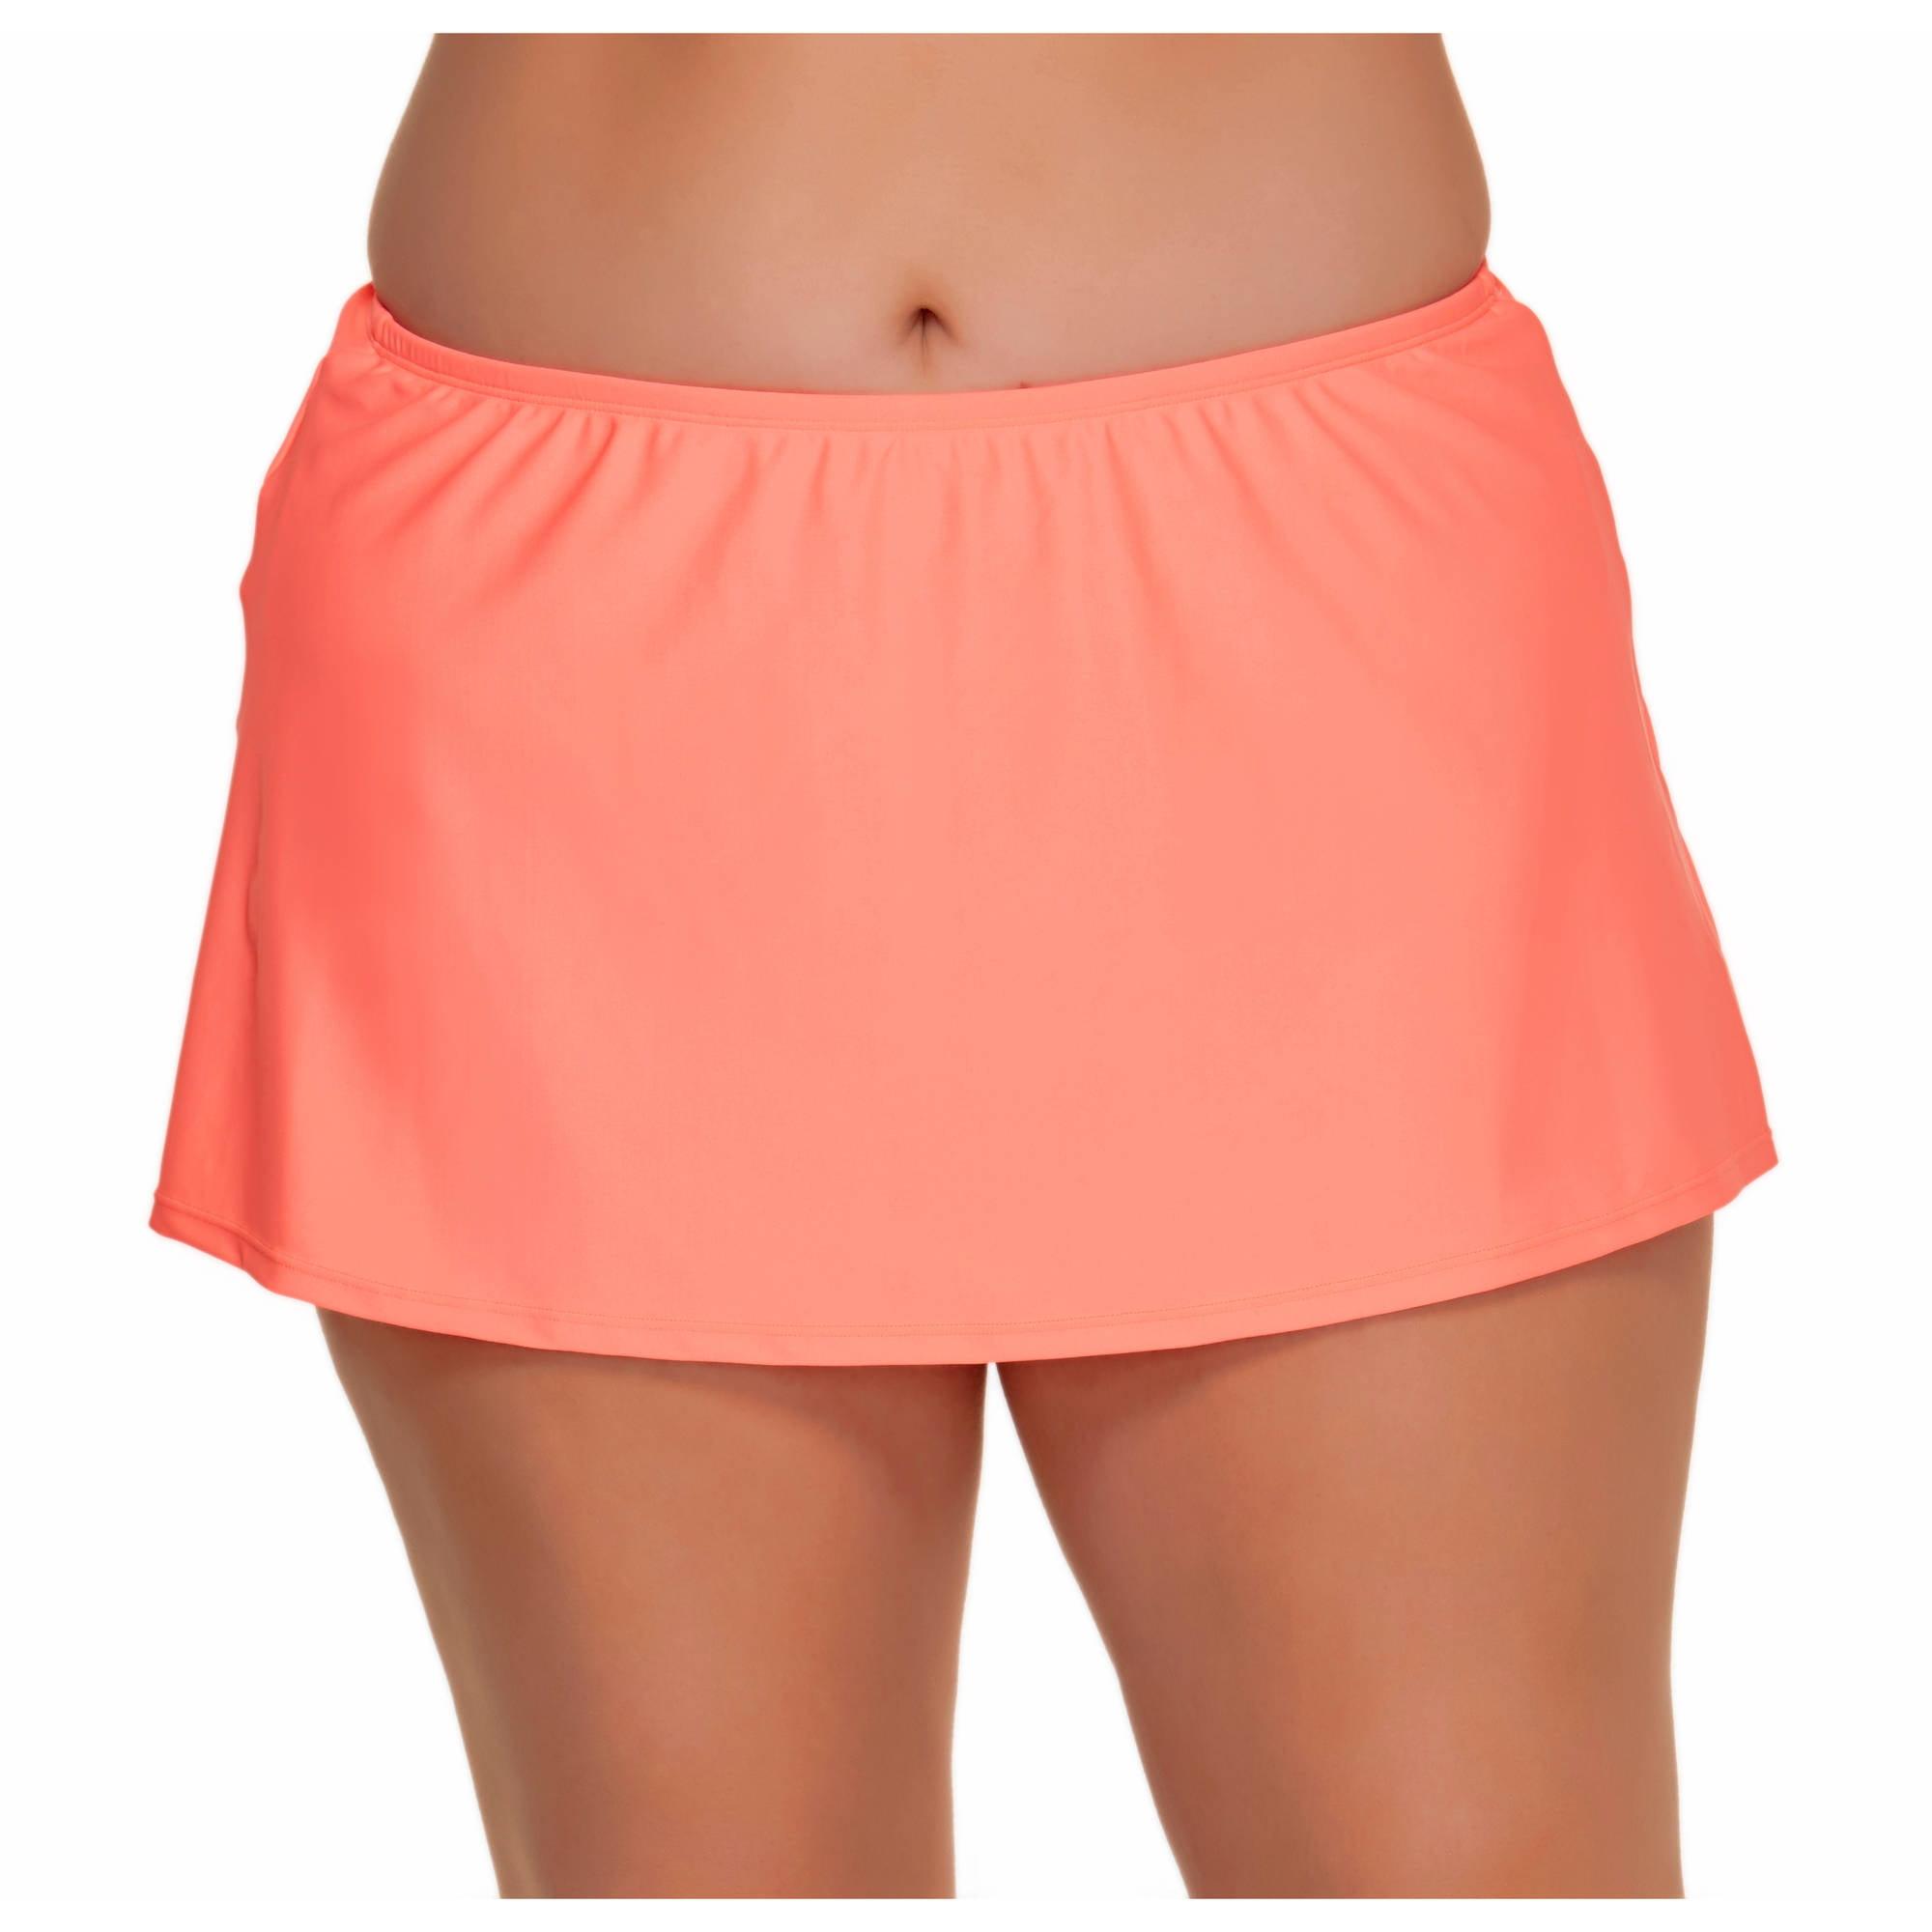 Catalina Women's Plus-Size Skirted Swimsuit Bottom